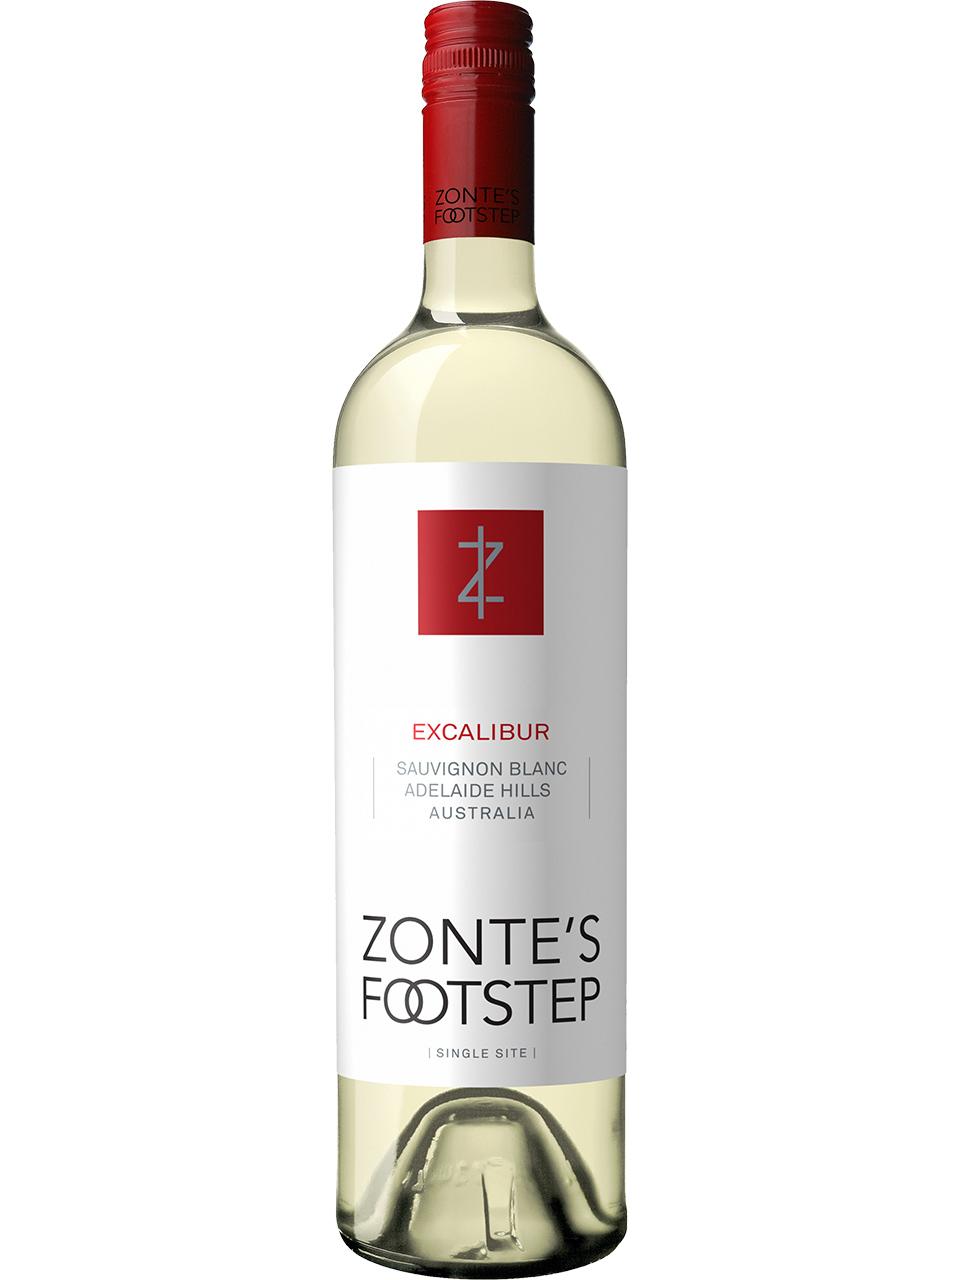 Zonte's Footstep Excalibur Sauvignon Blanc